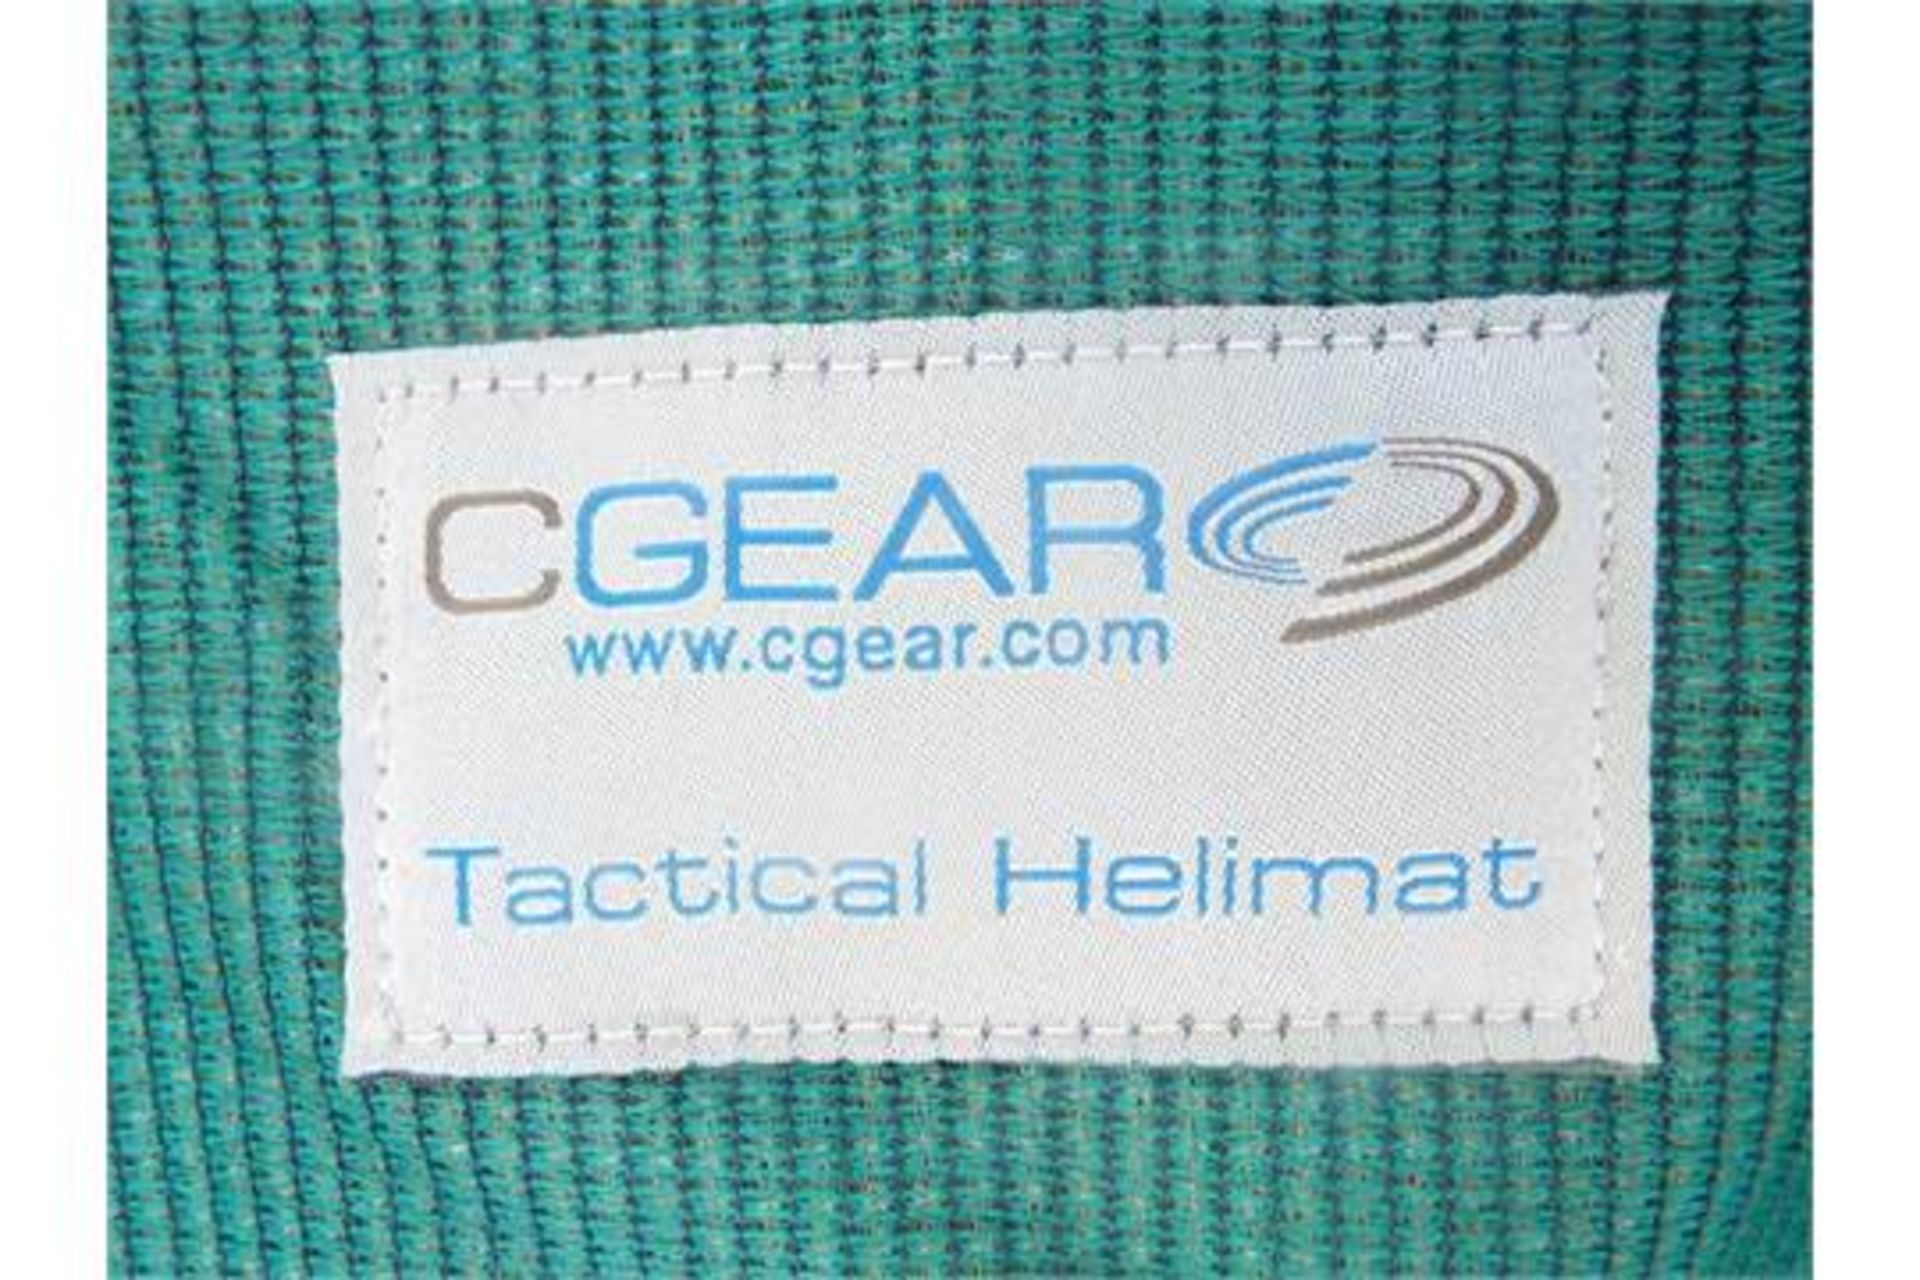 Lot 26850 - CGear Tactical Helimat 6m x 6m